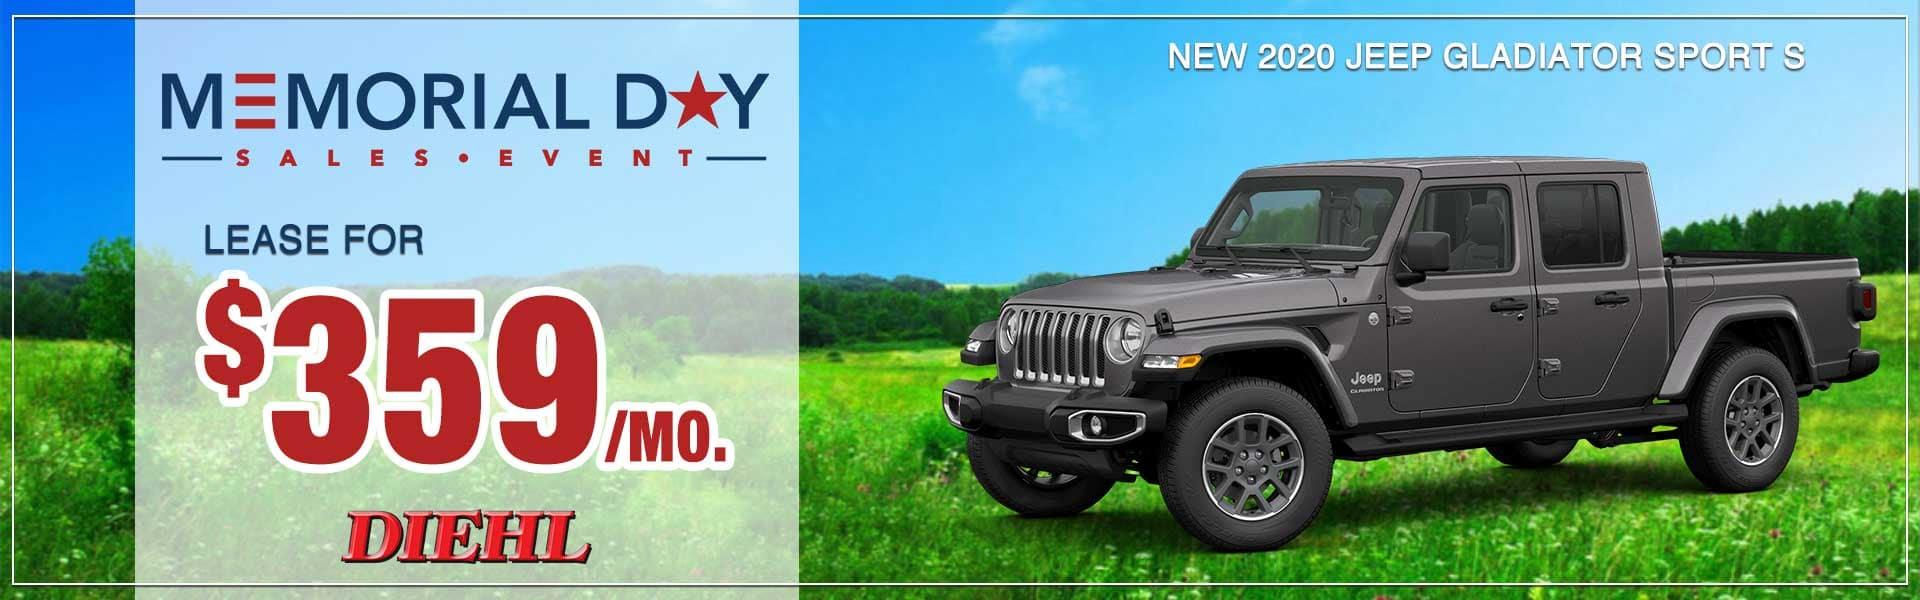 memorial day sales event jeep gladiator jeep lease diehl robinson wrangler jeepfest bantam